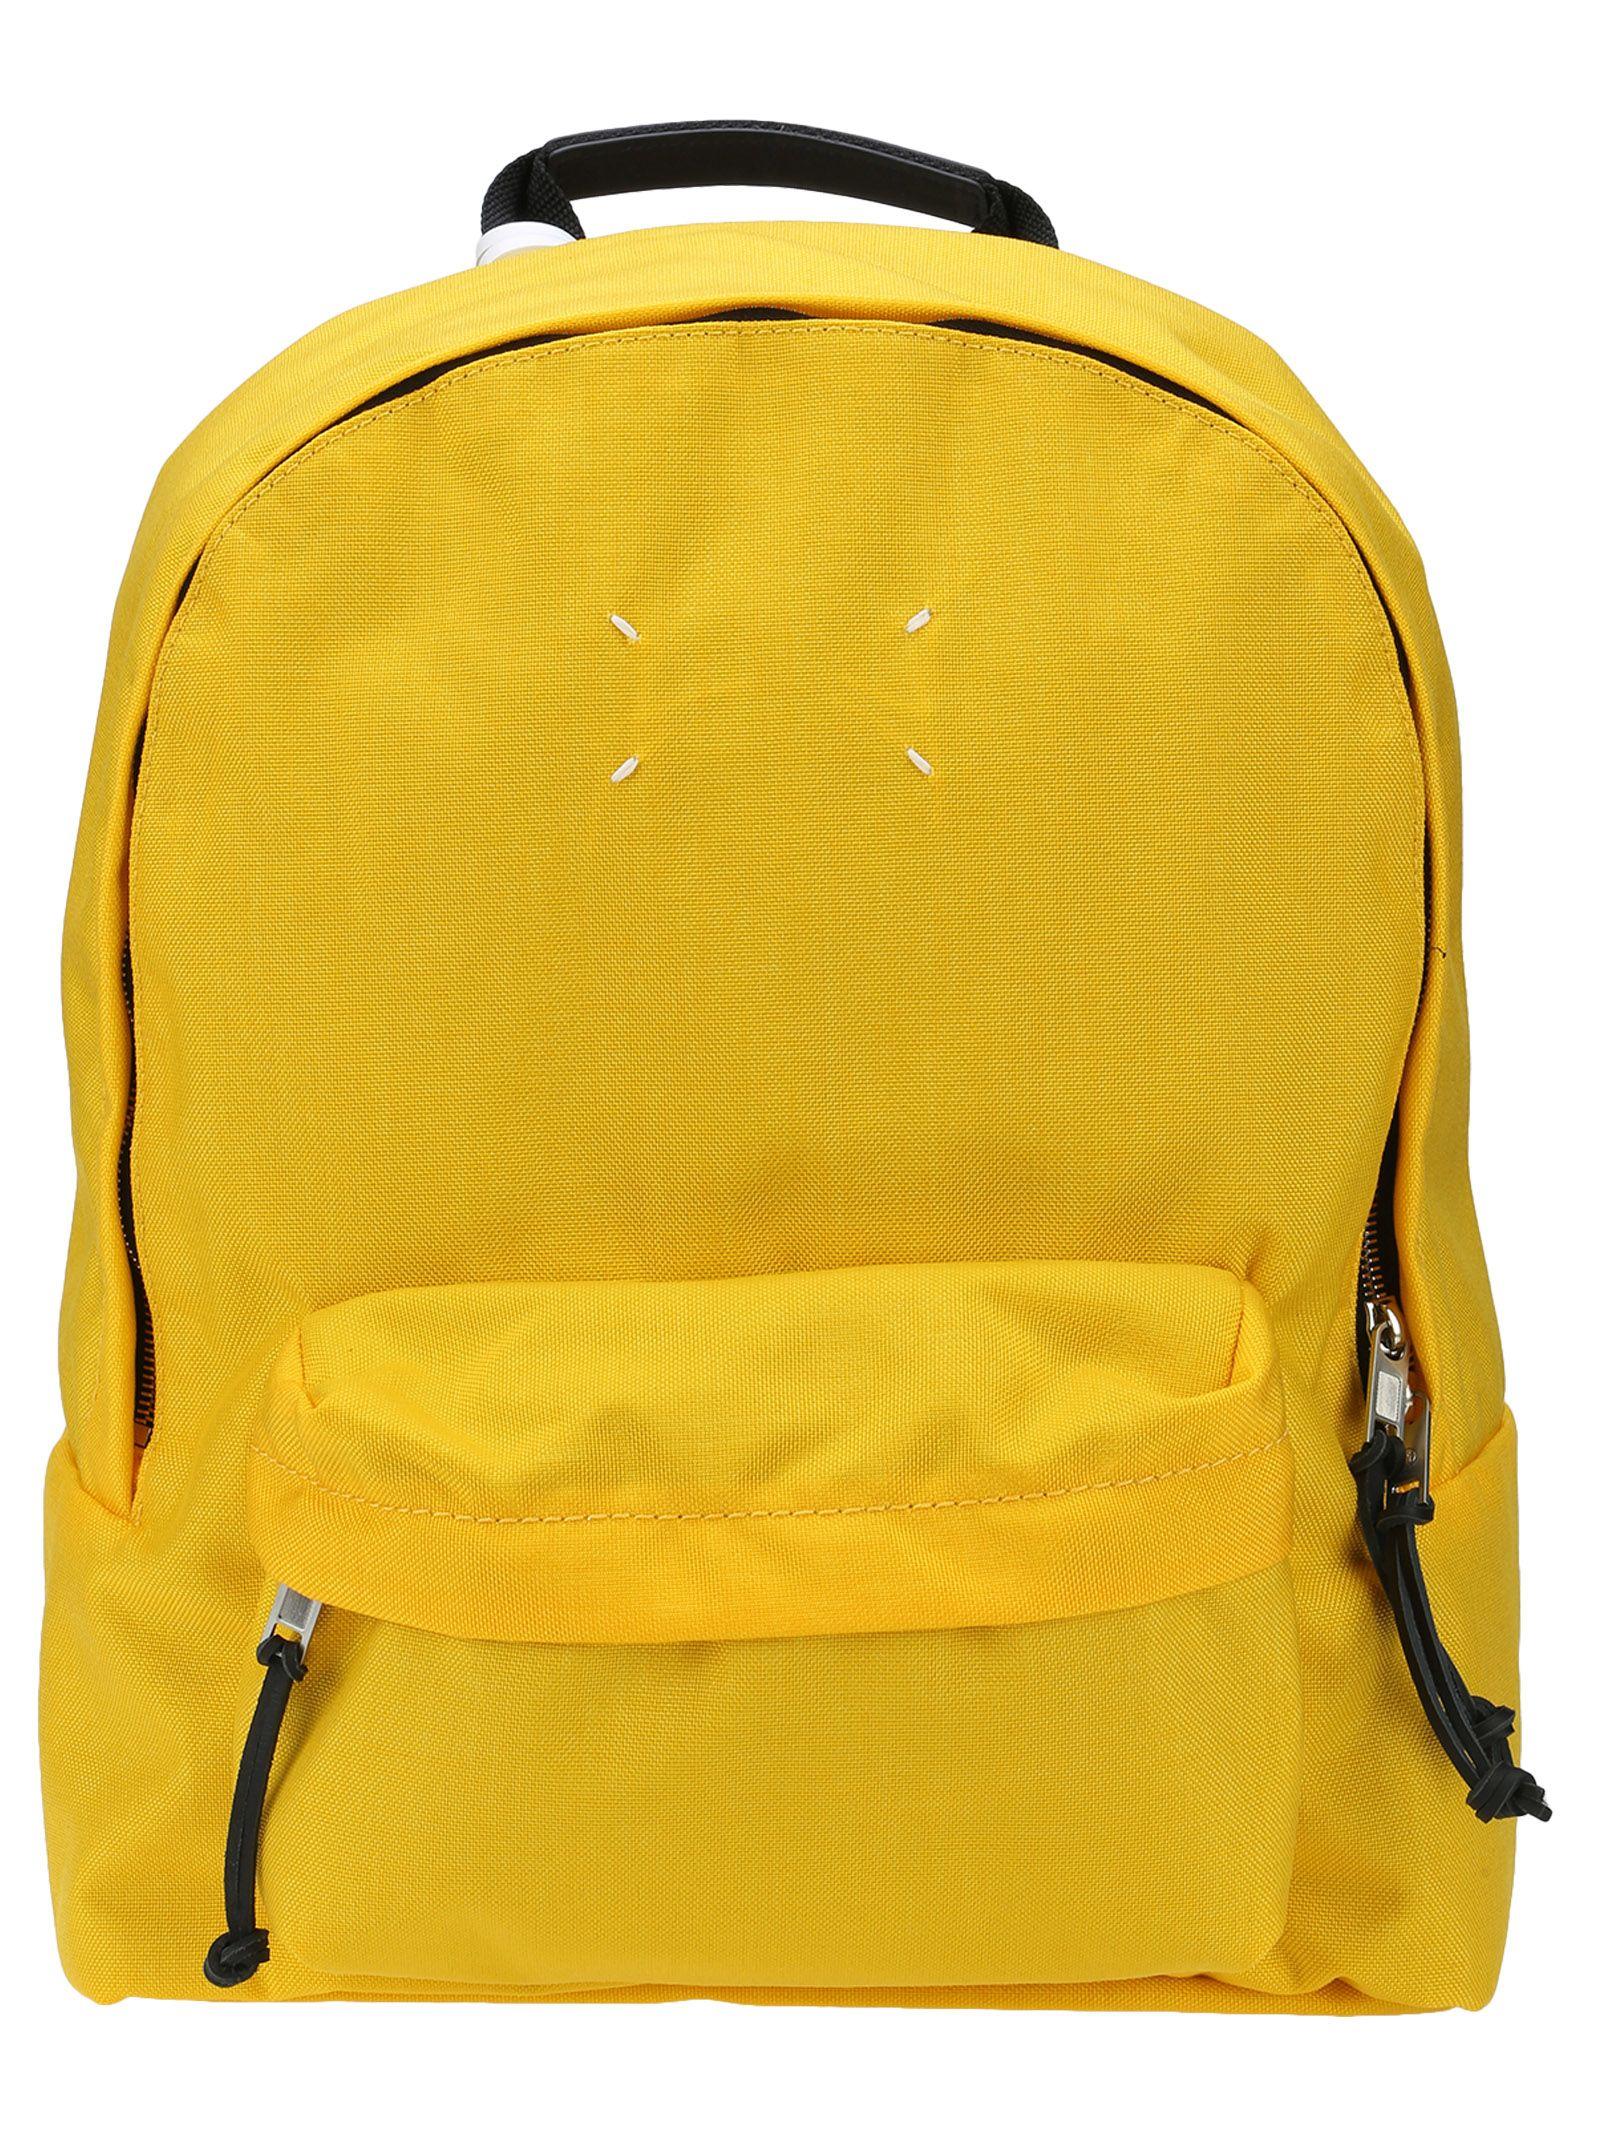 Martin Margiela Backpack Medium